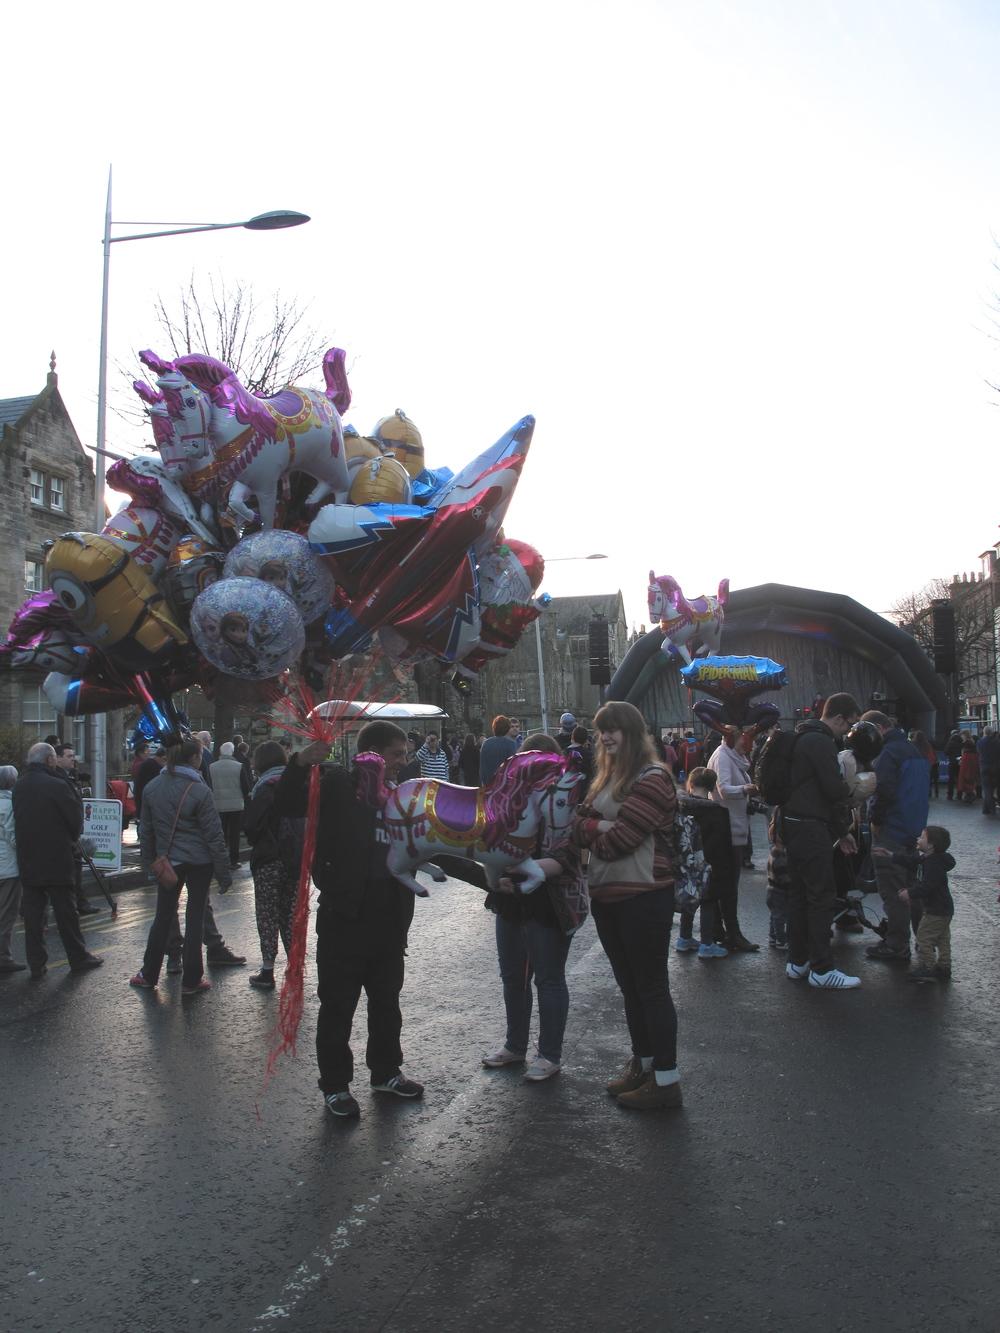 Balloon seller in St Andrews on St Andrew's day.